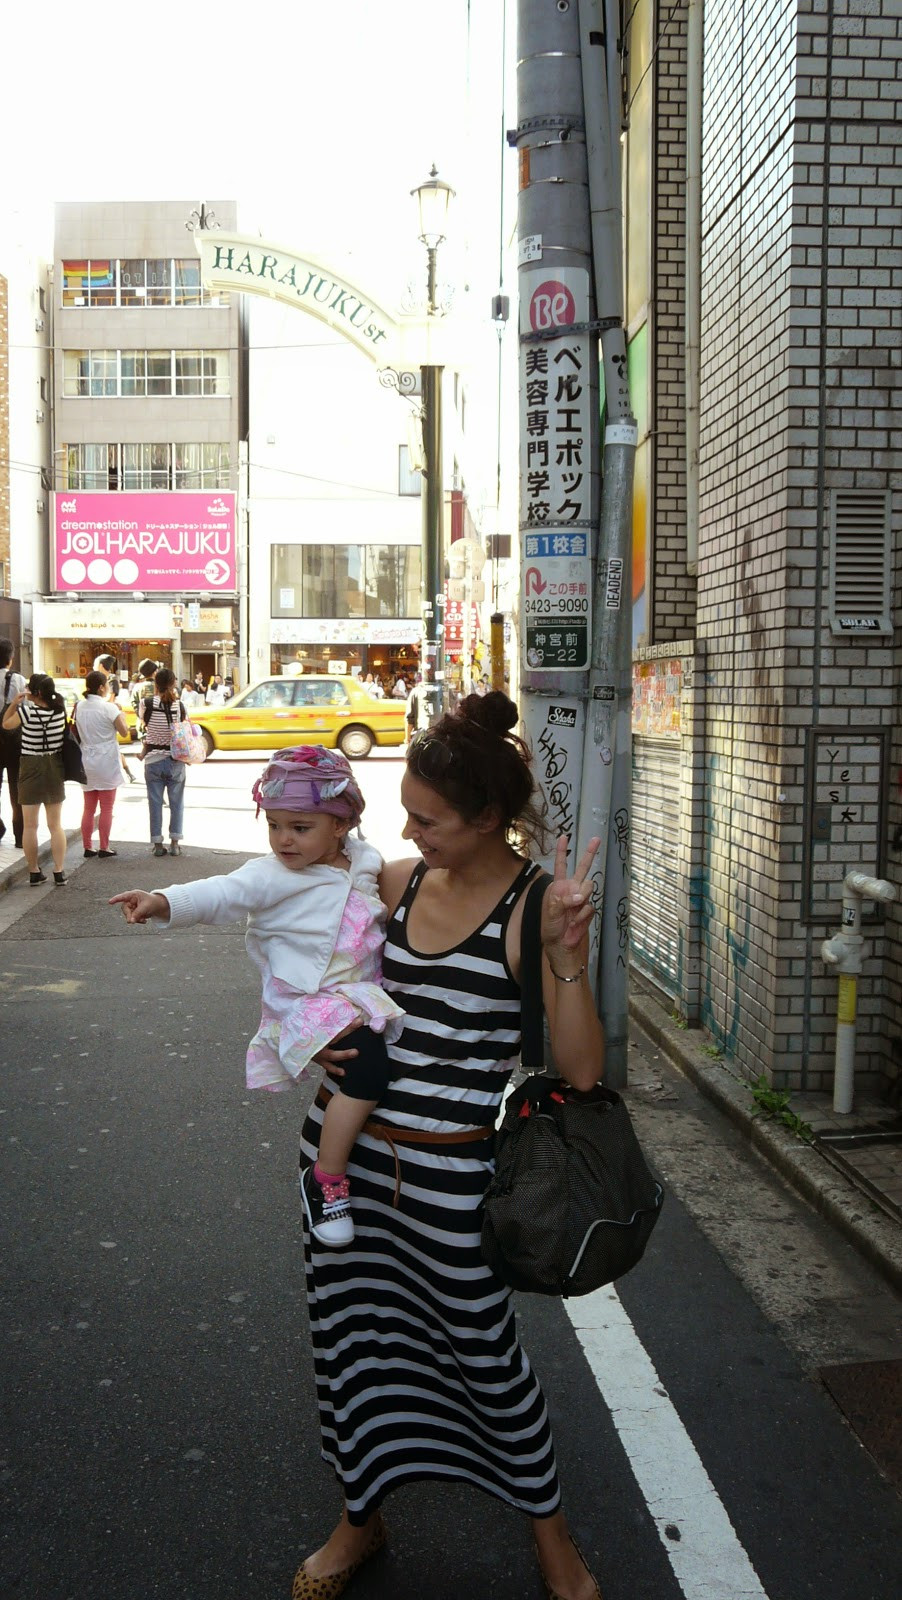 Tokio / tradi.pt